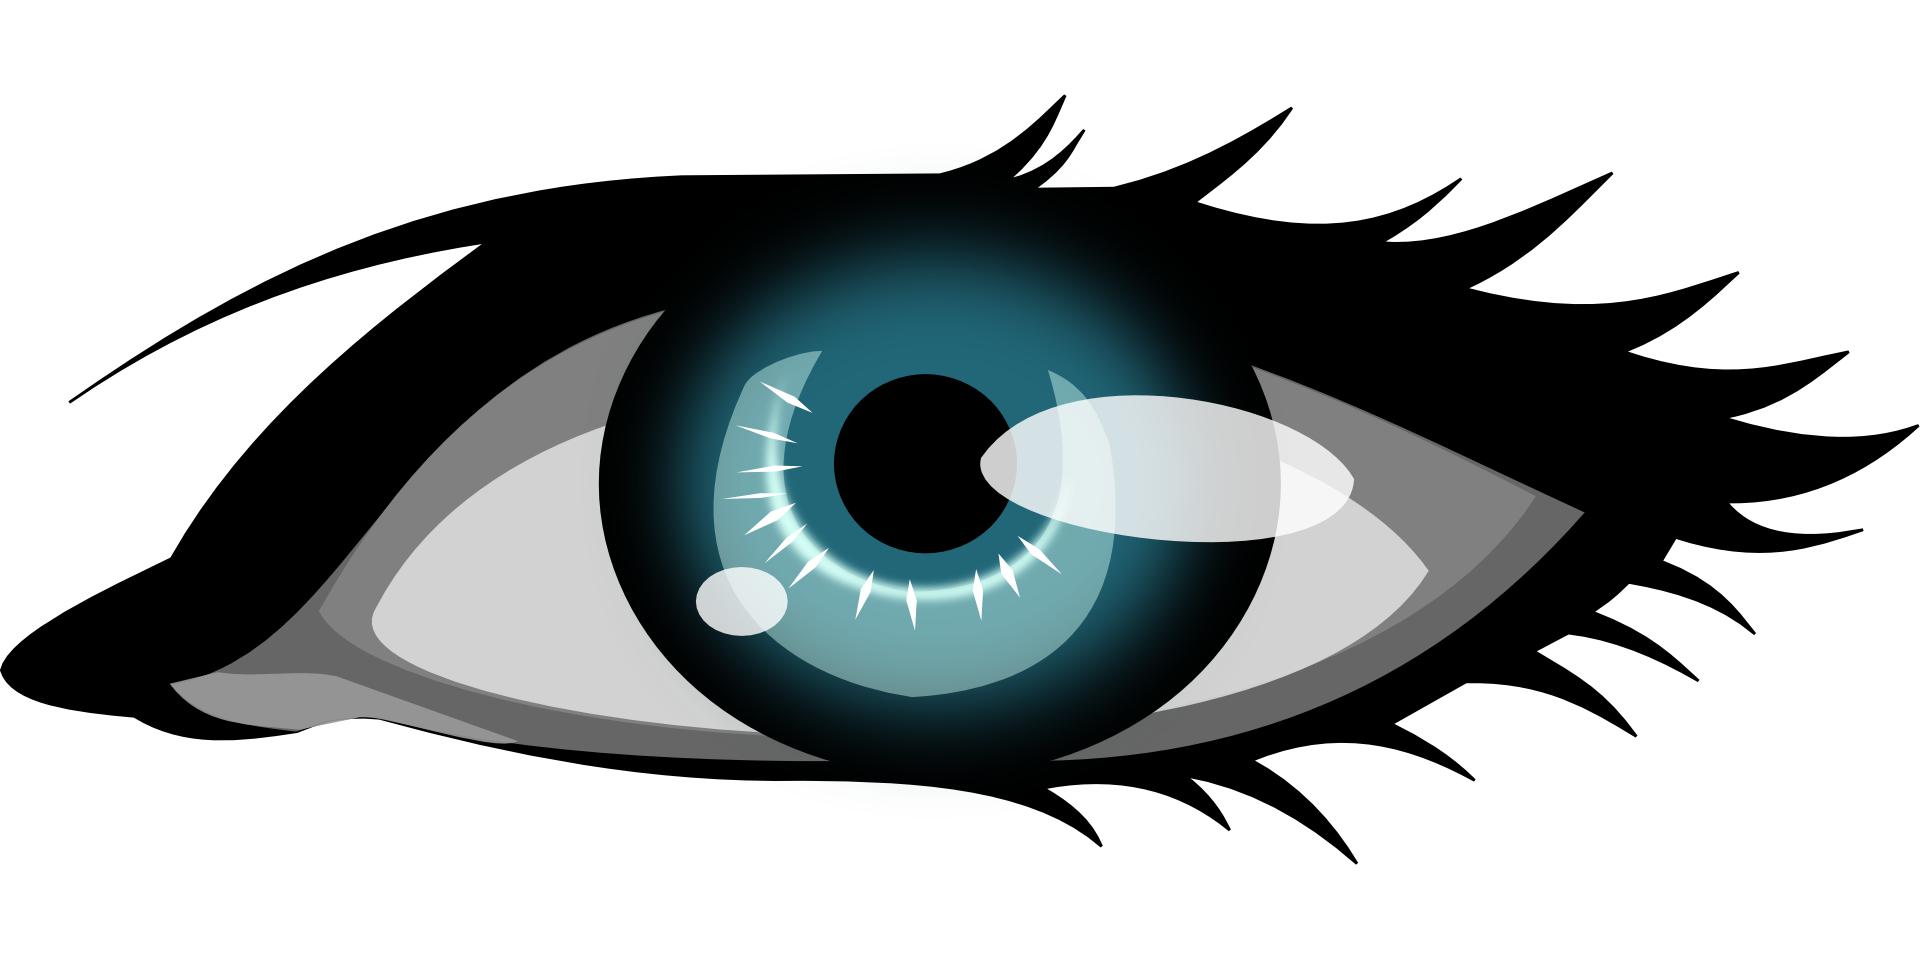 Artistic eye,eyelash vector – Free PSD,Vector,Icons